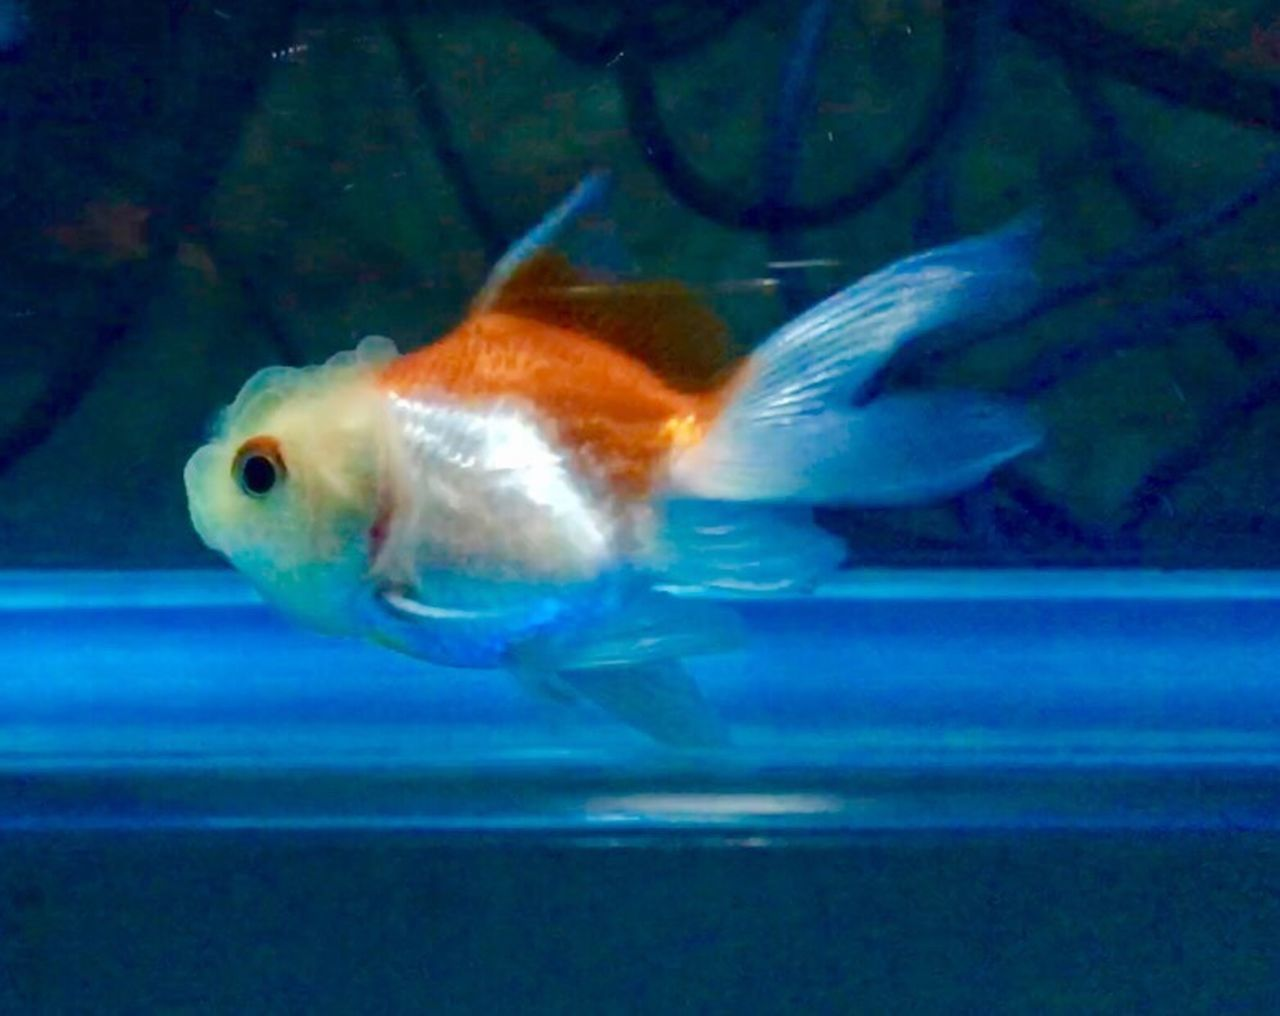 one animal, swimming, underwater, animal themes, fish, water, no people, goldfish, indoors, sea life, close-up, animals in the wild, aquarium, nature, day, undersea